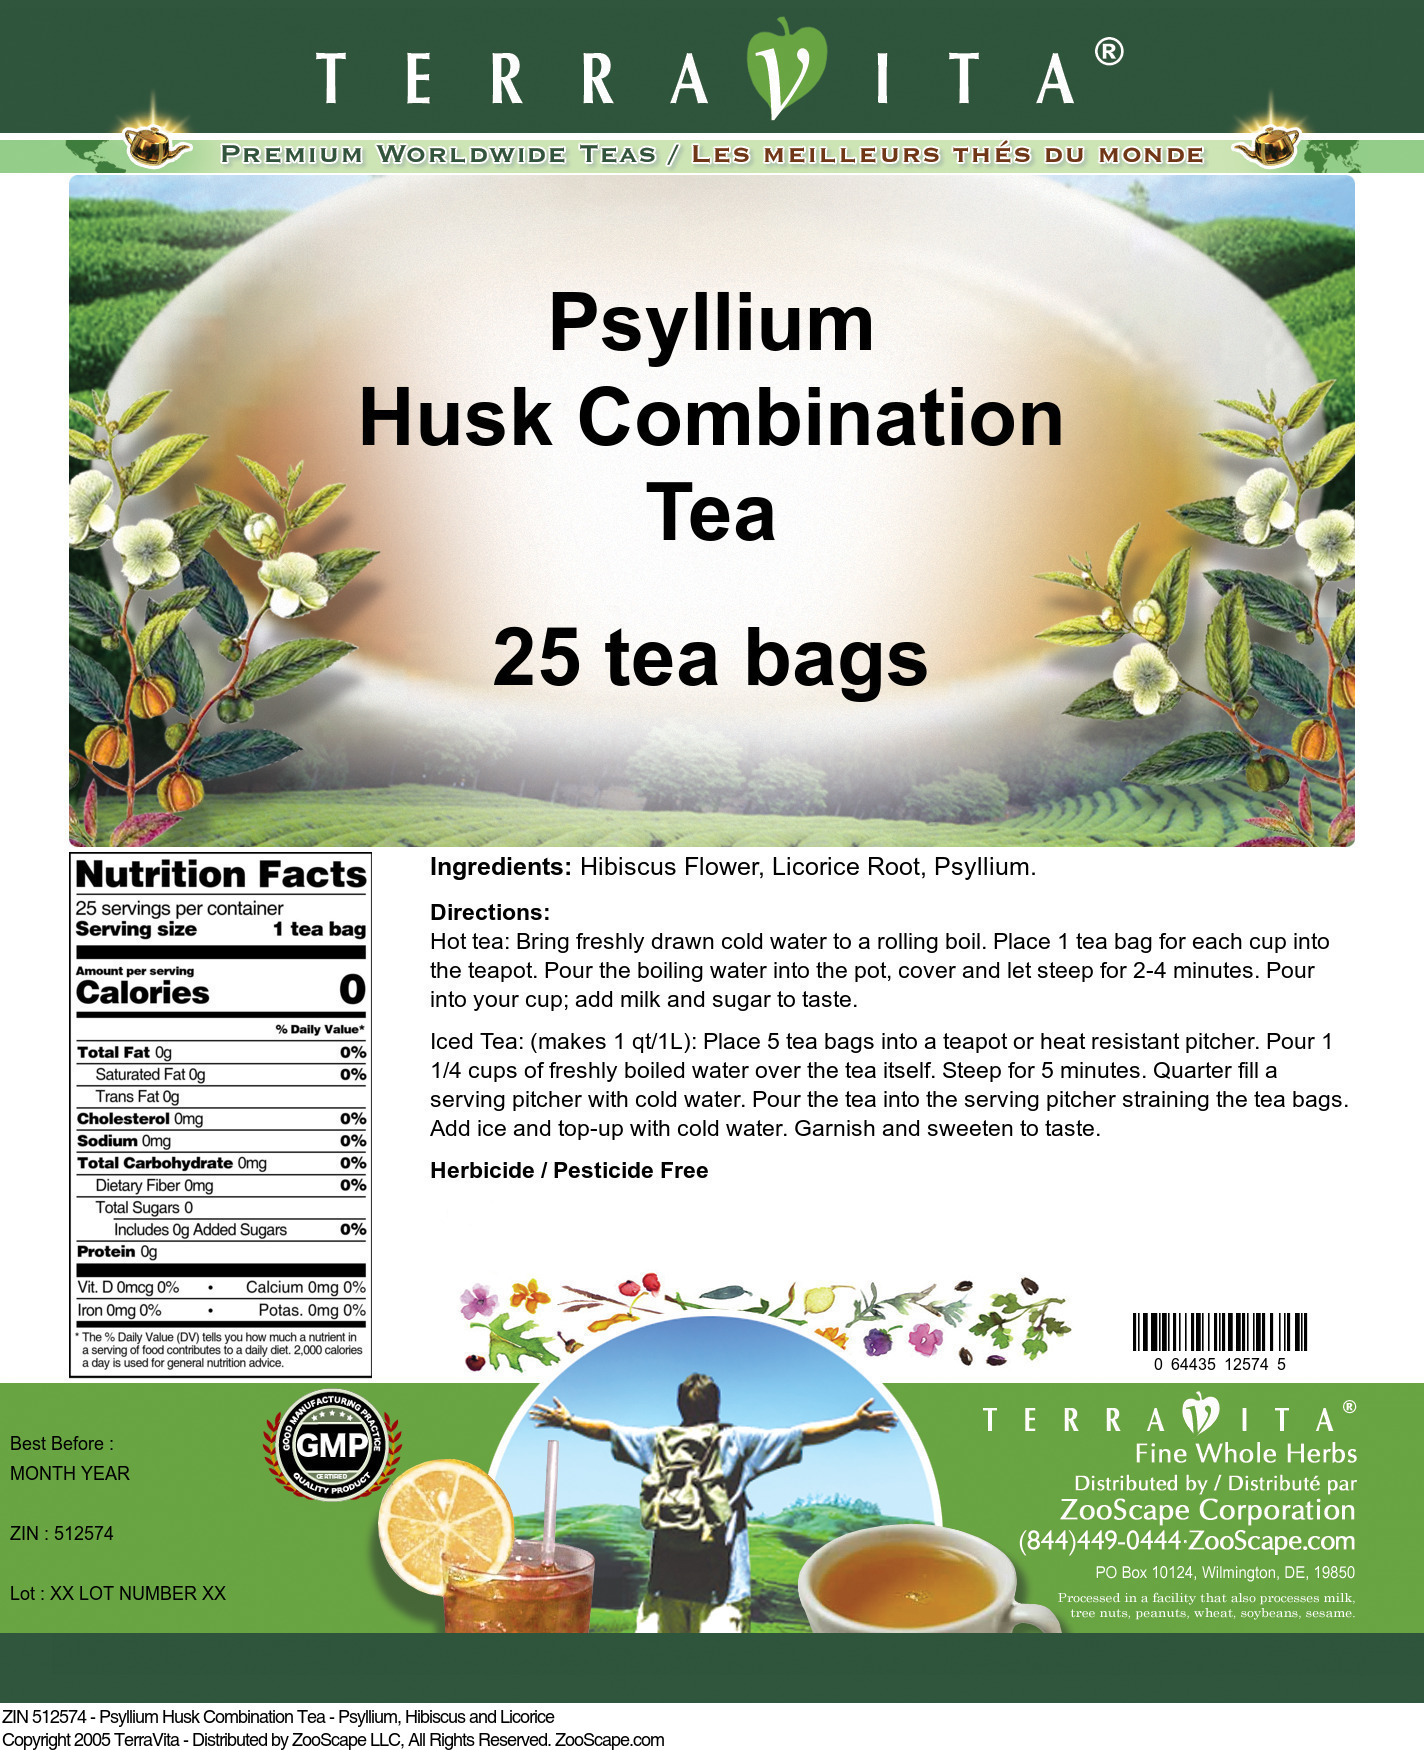 Psyllium Husk Combination Tea - Psyllium, Hibiscus and Licorice